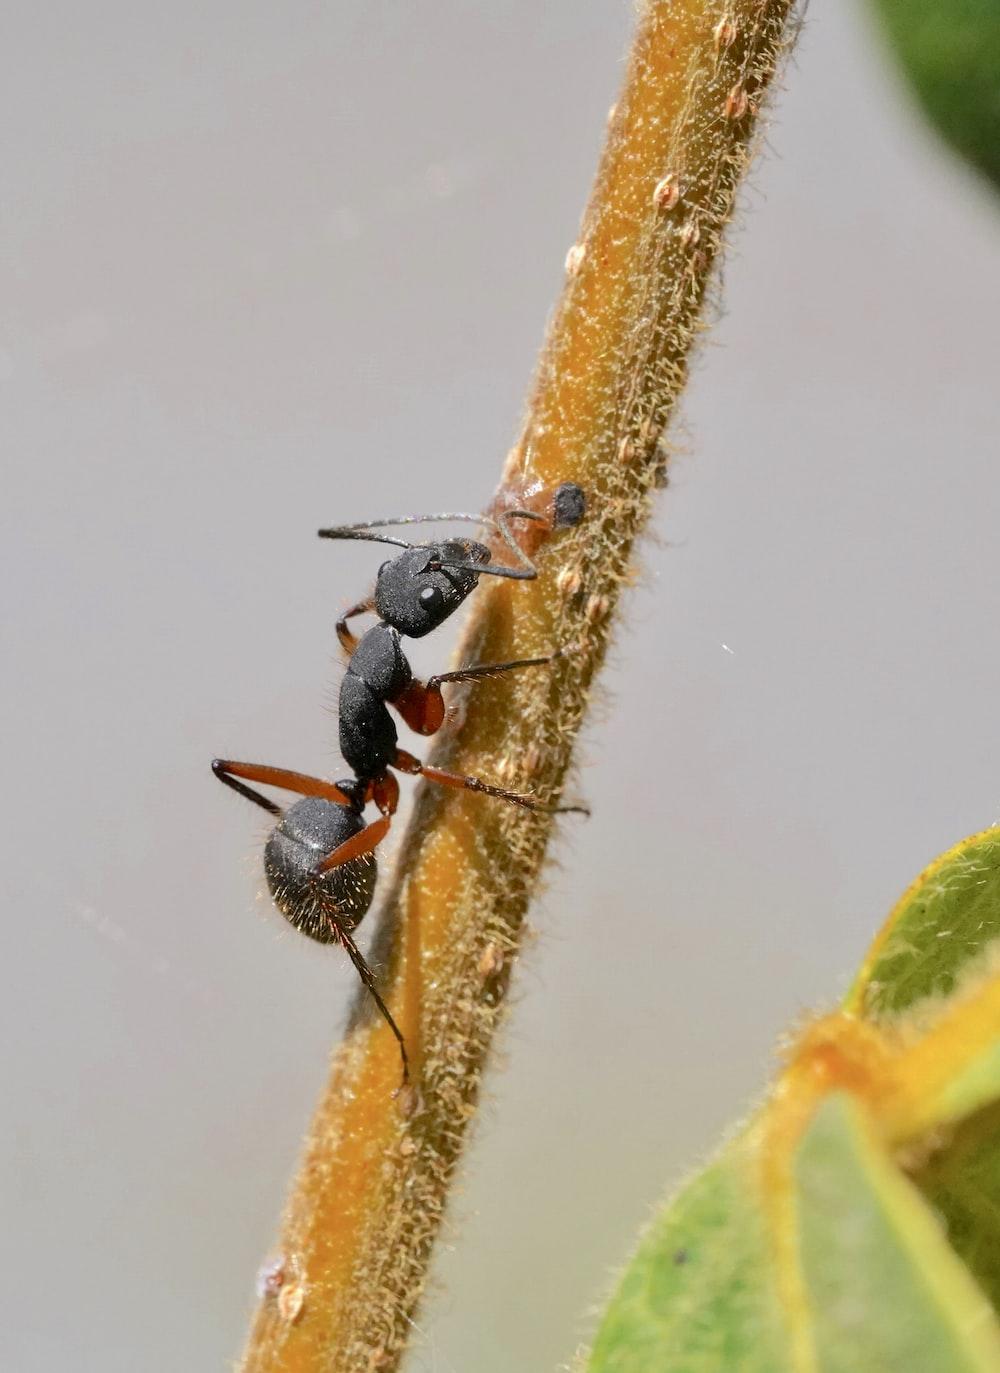 black ant on white surface